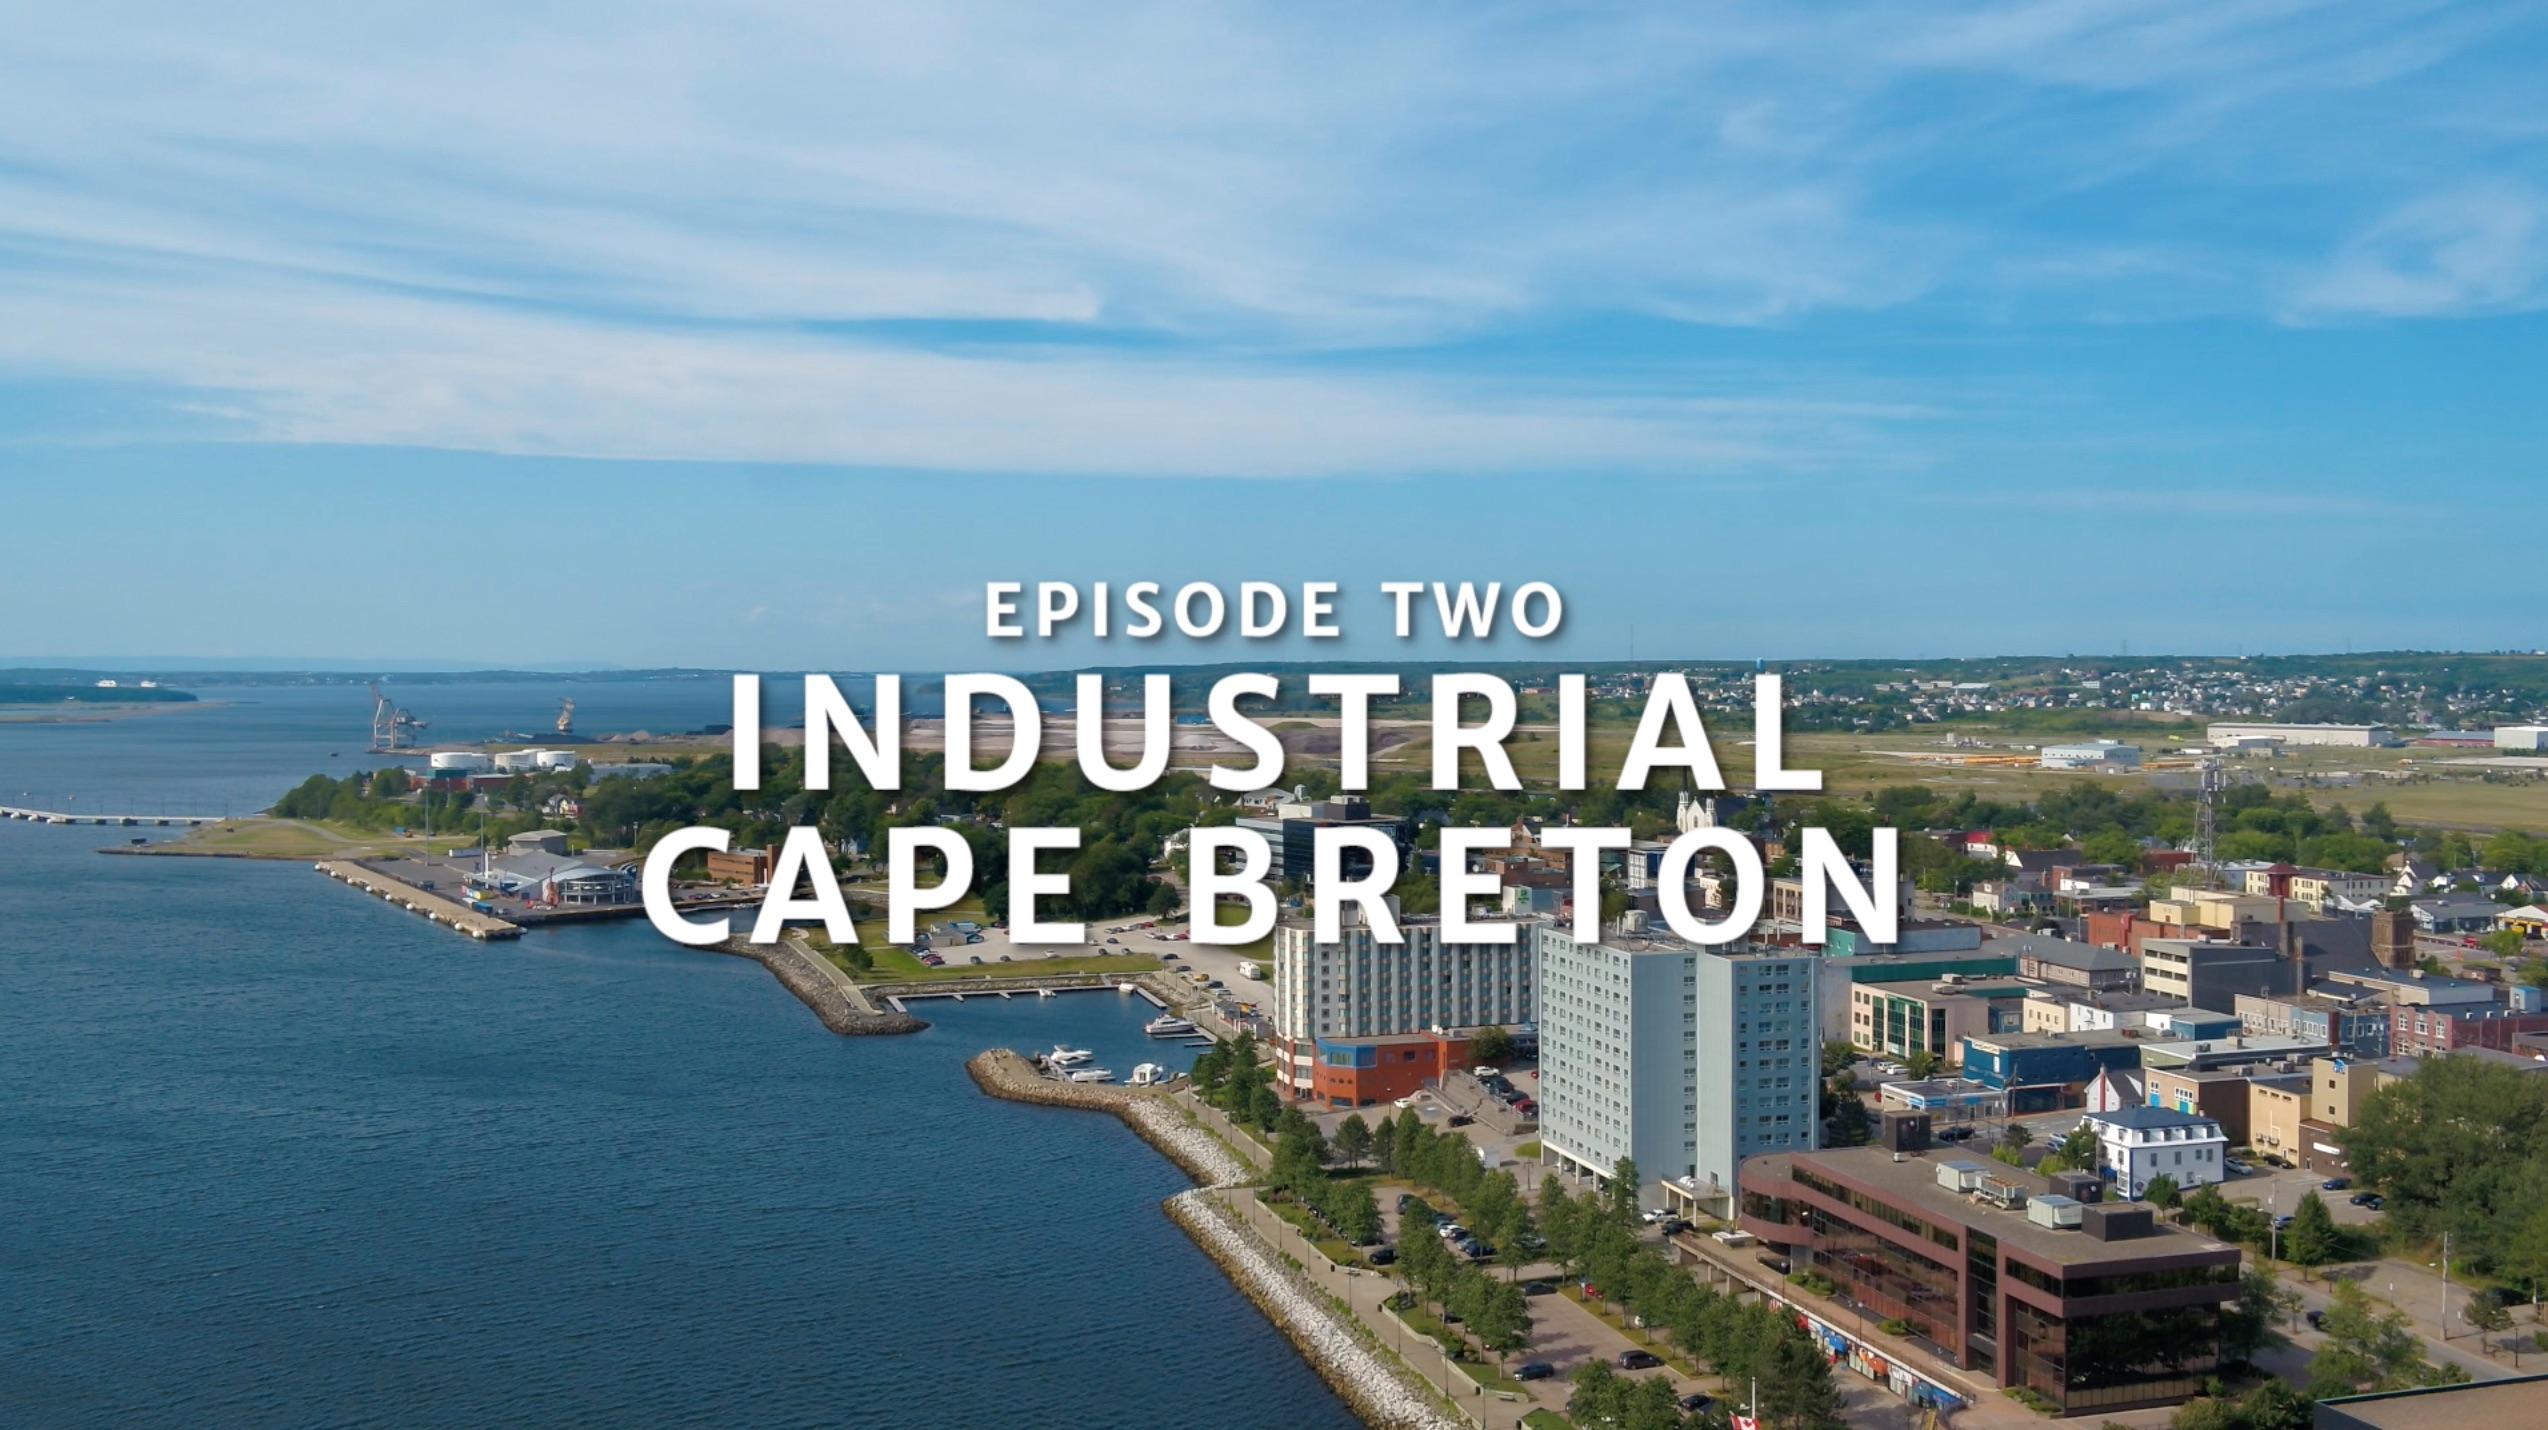 Industrial Cape Breton